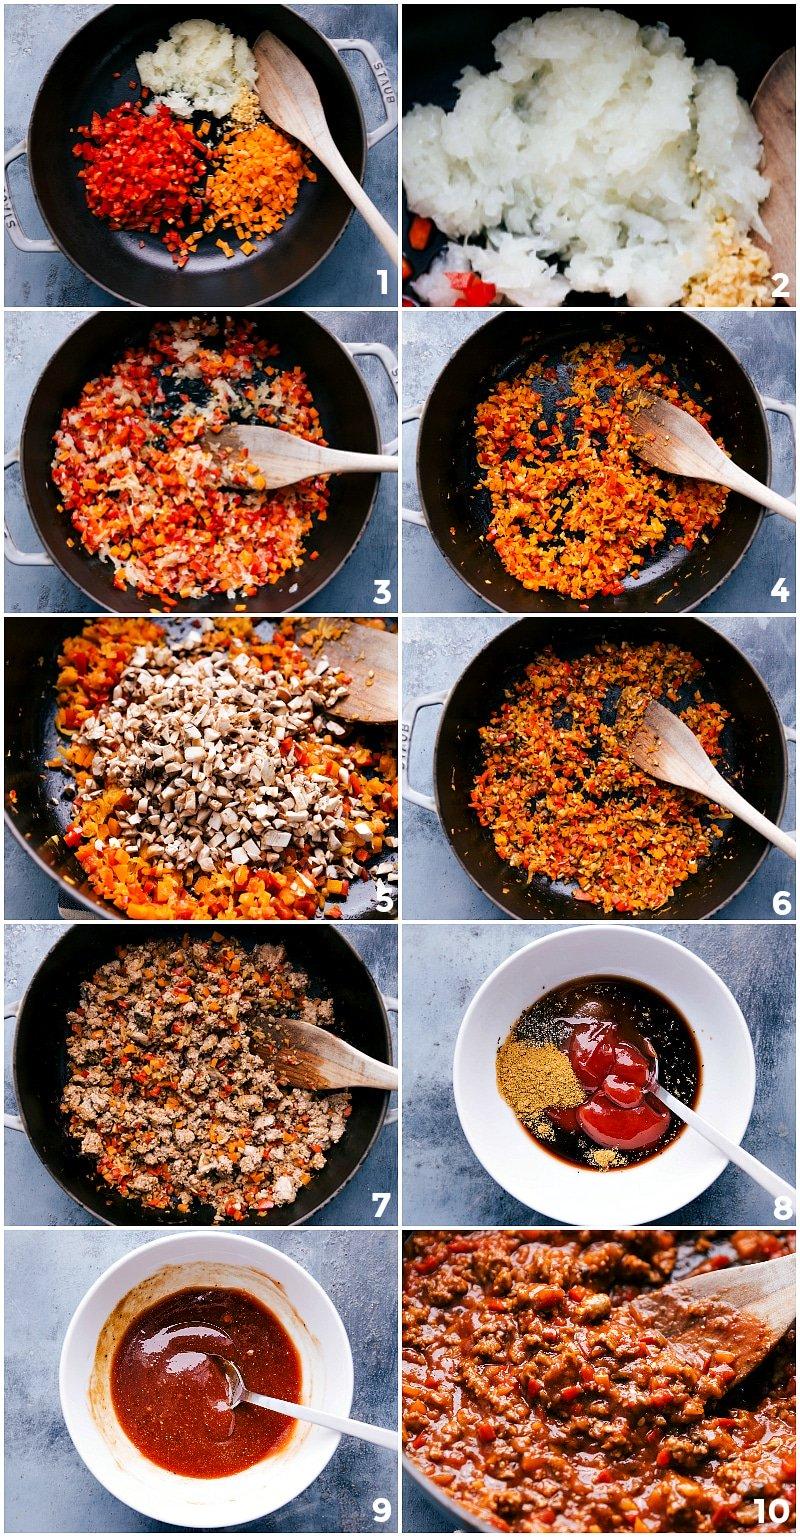 Process shots: steps in cooking Turkey Sloppy Joes.